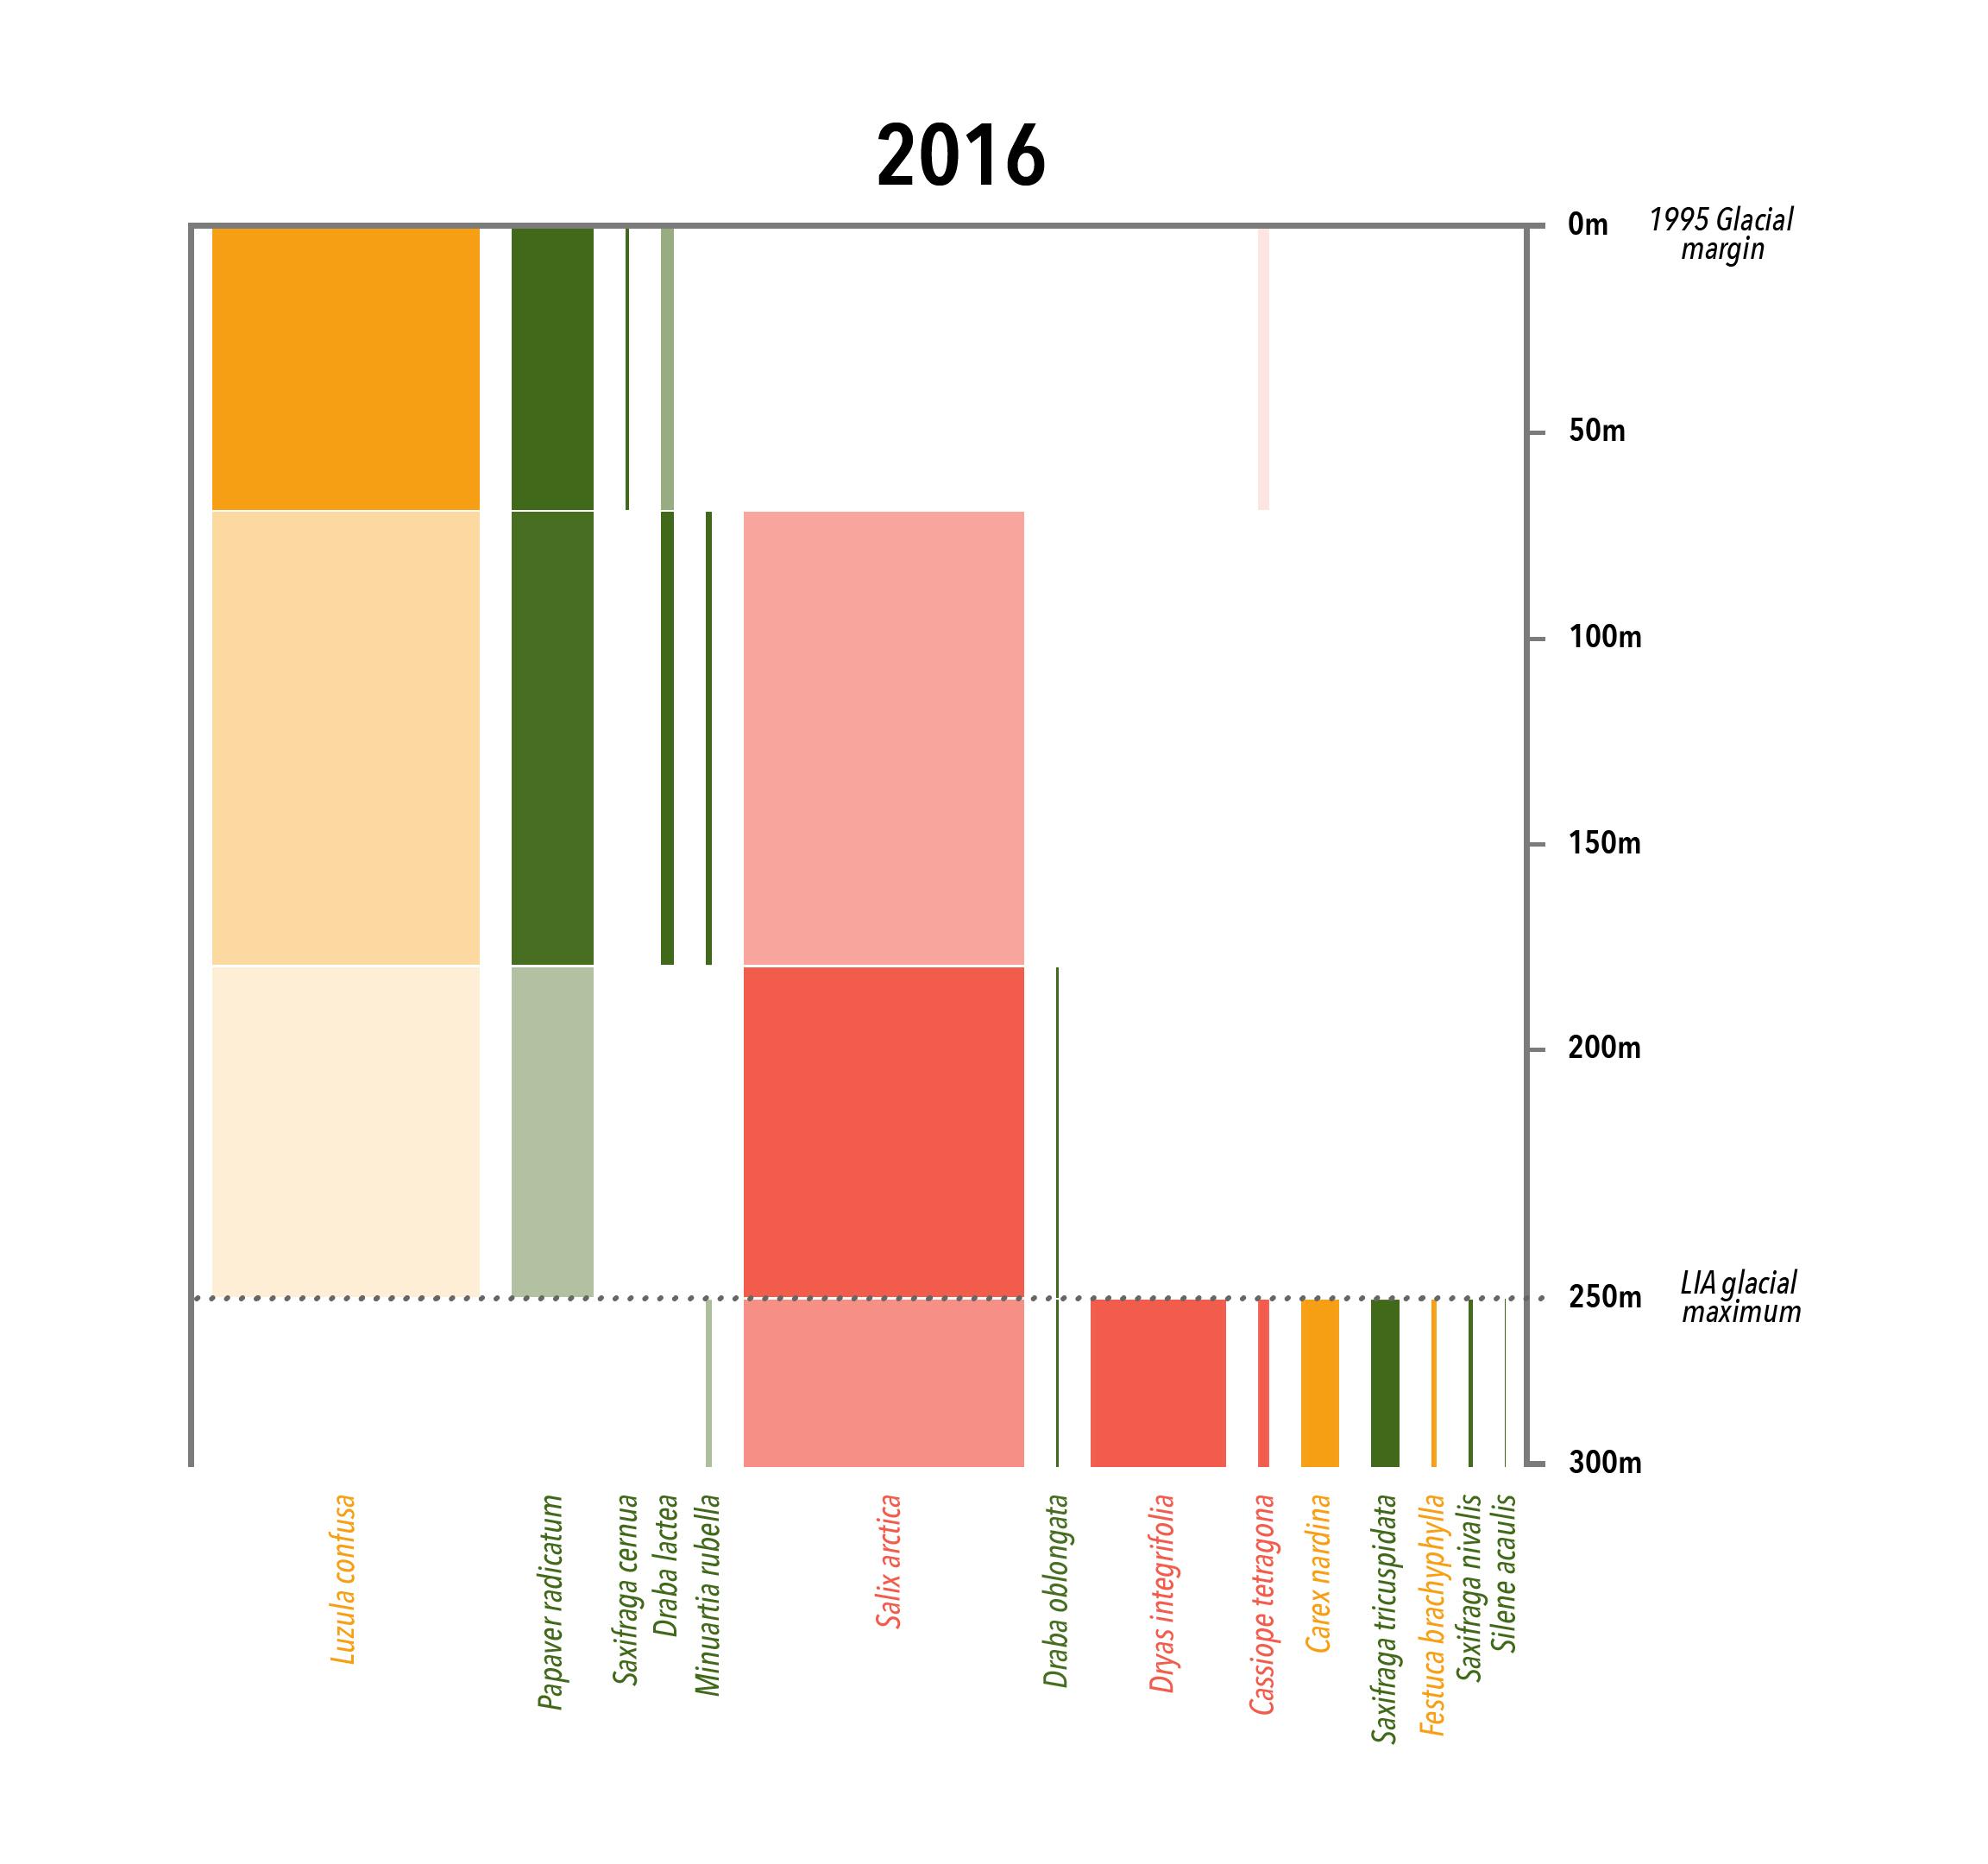 indicatorspecies_2016small_newWidths.jpg